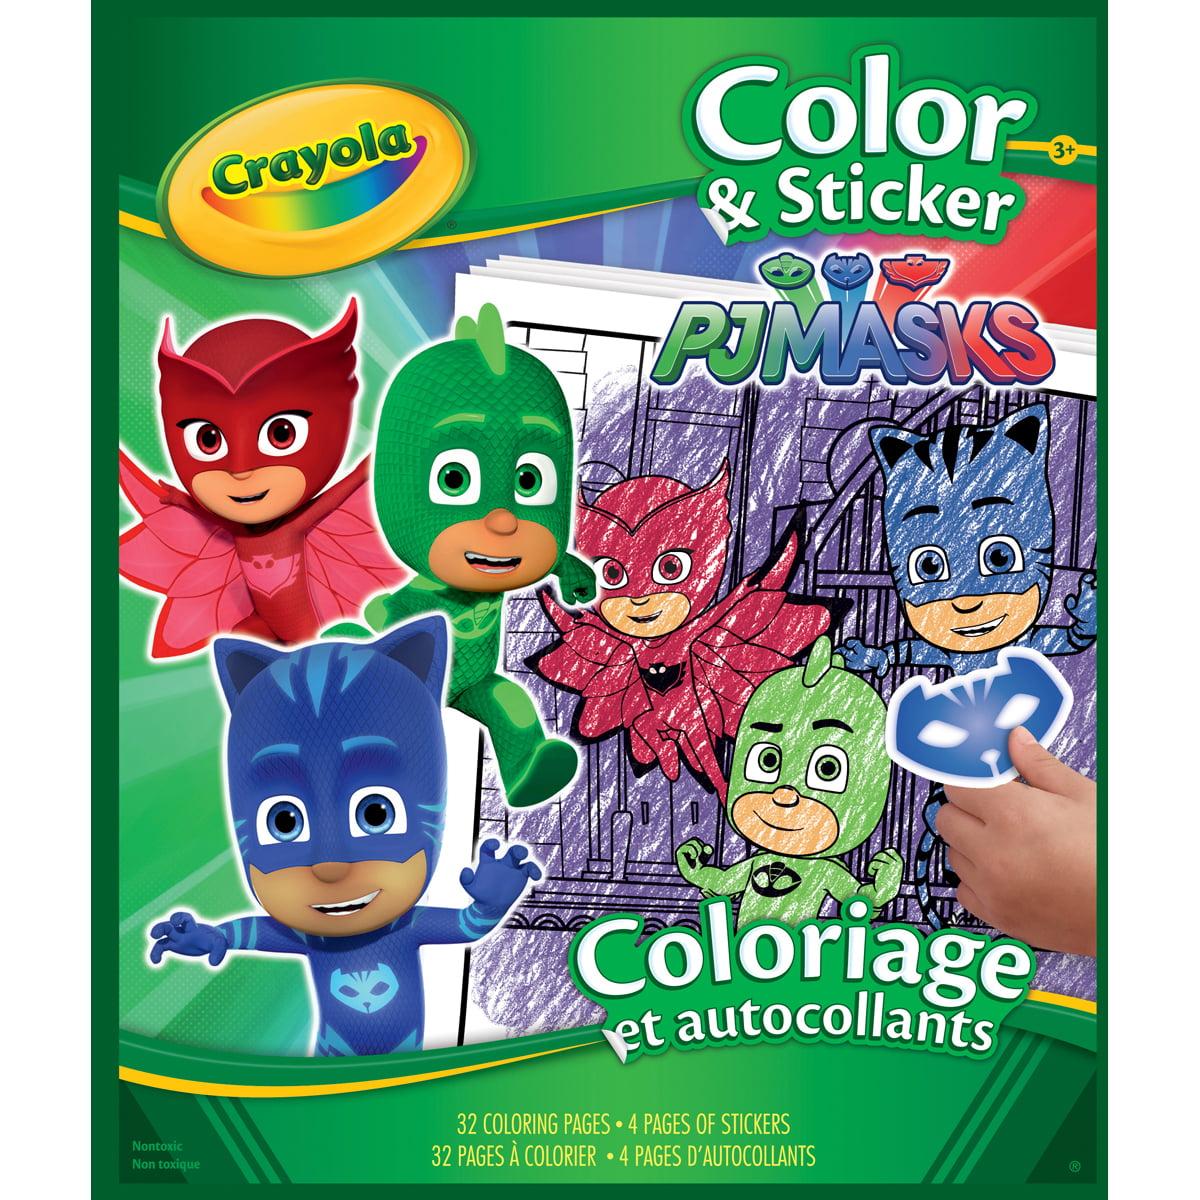 Crayola Color 'N Sticker Book 10X85-Pj Masks